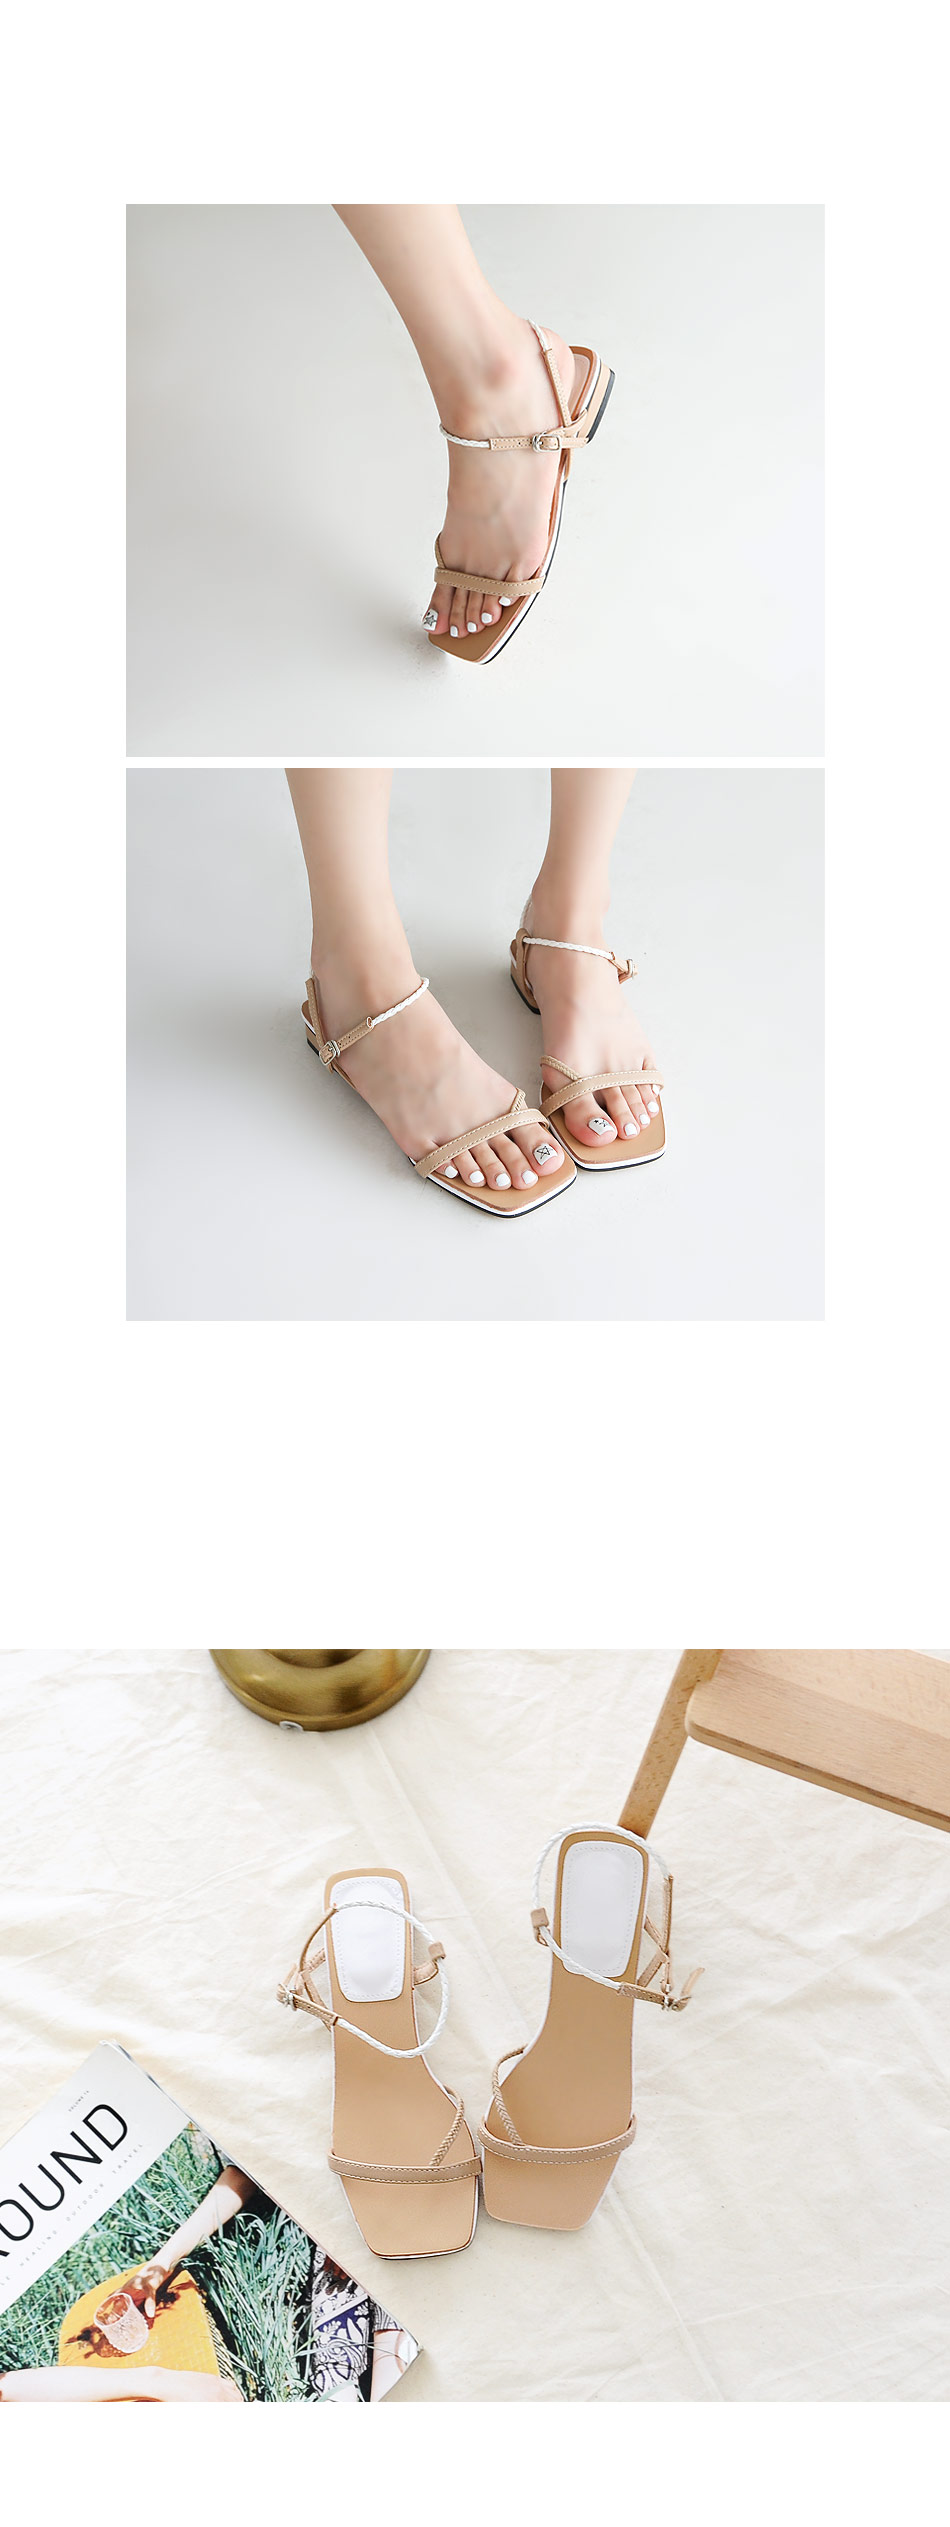 Obsess Sling Back Sandals 2cm